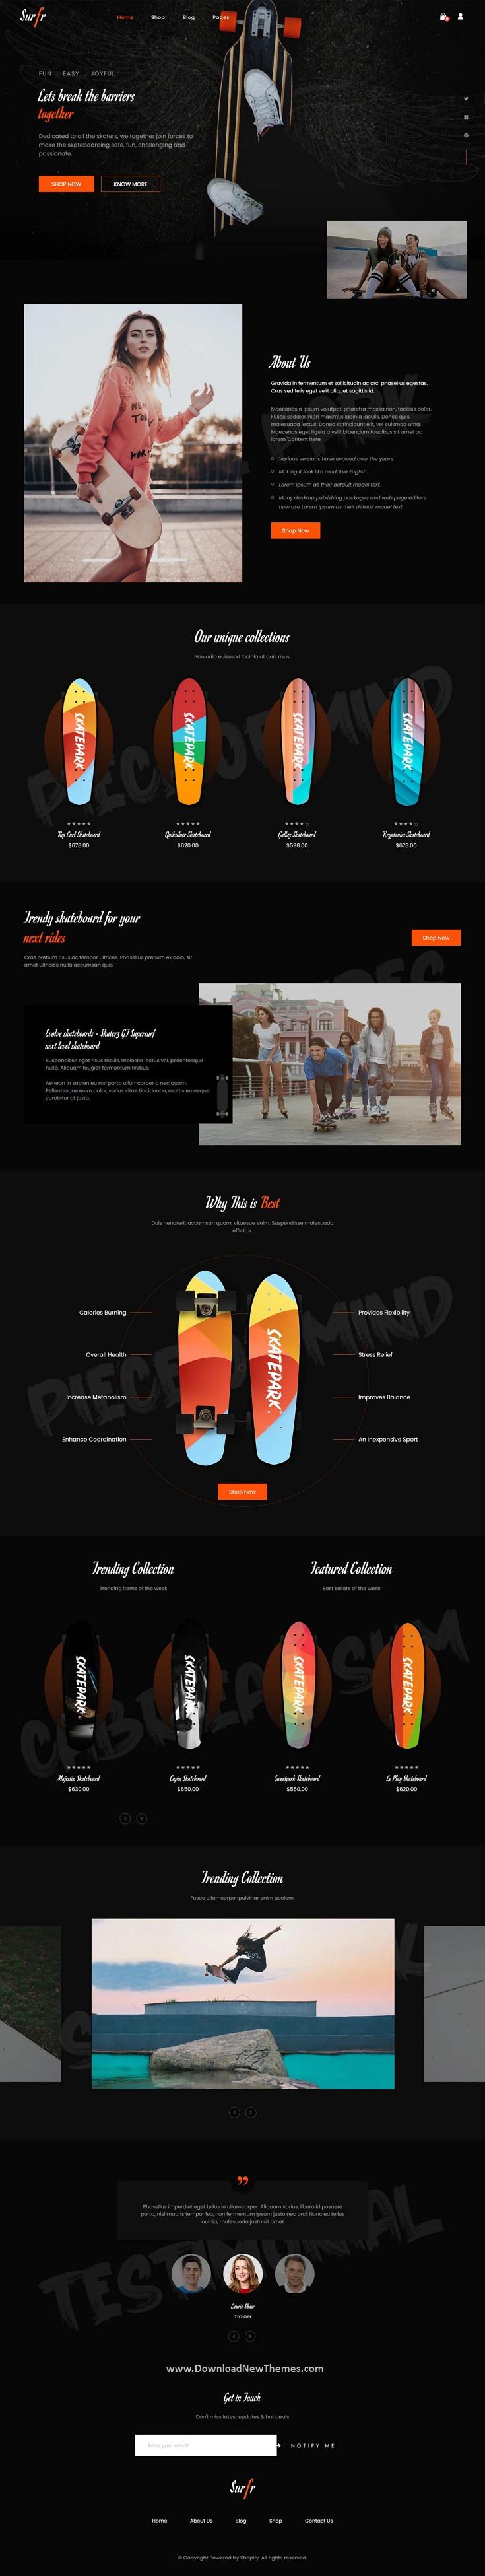 Skateboard Single Product Shopify Theme